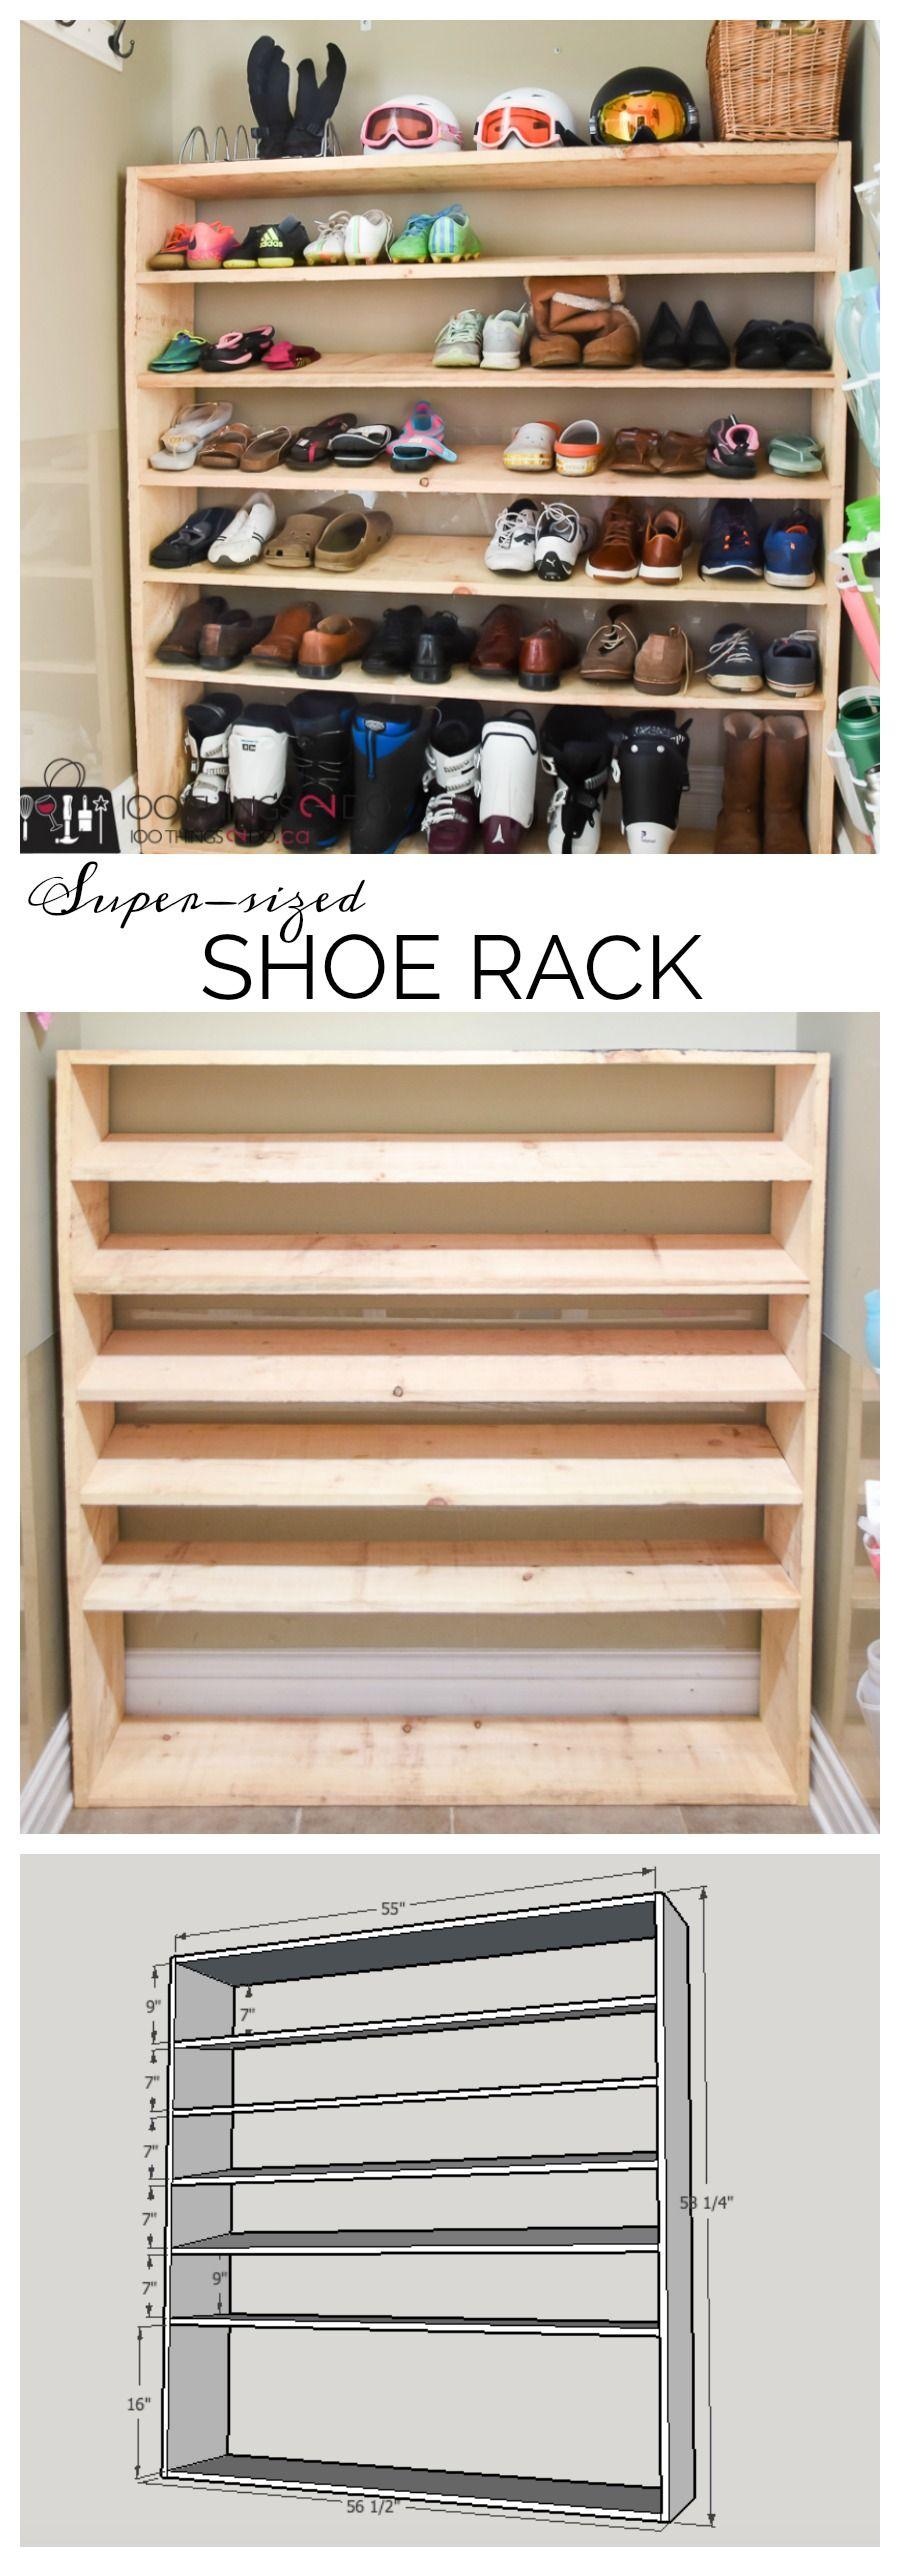 how to make a super sized shoe rack on a budget garage on wood shoe rack diy simple id=86963